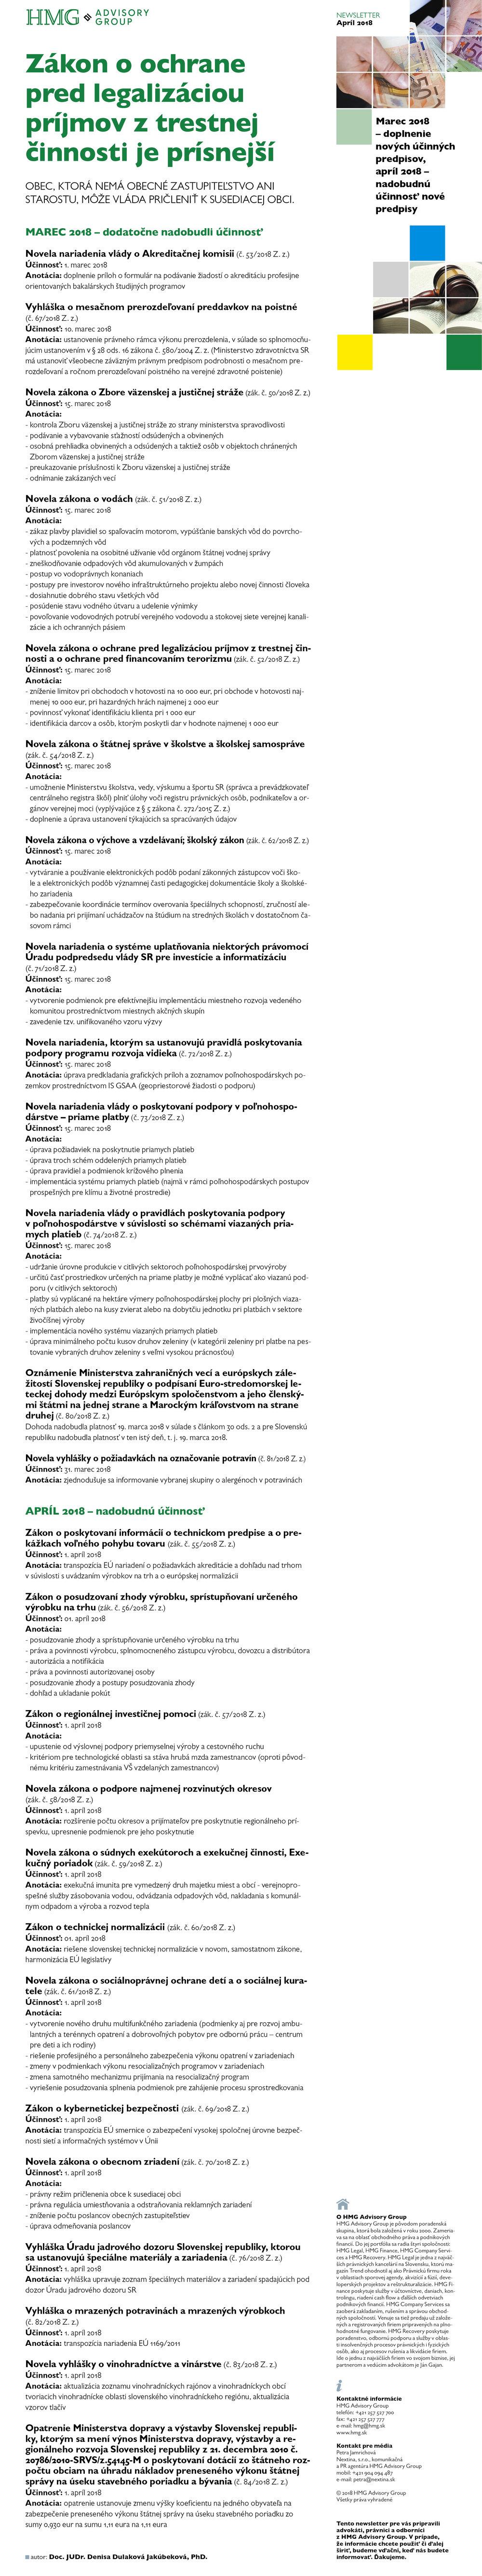 HMG_newsletter_legalizacia.jpg